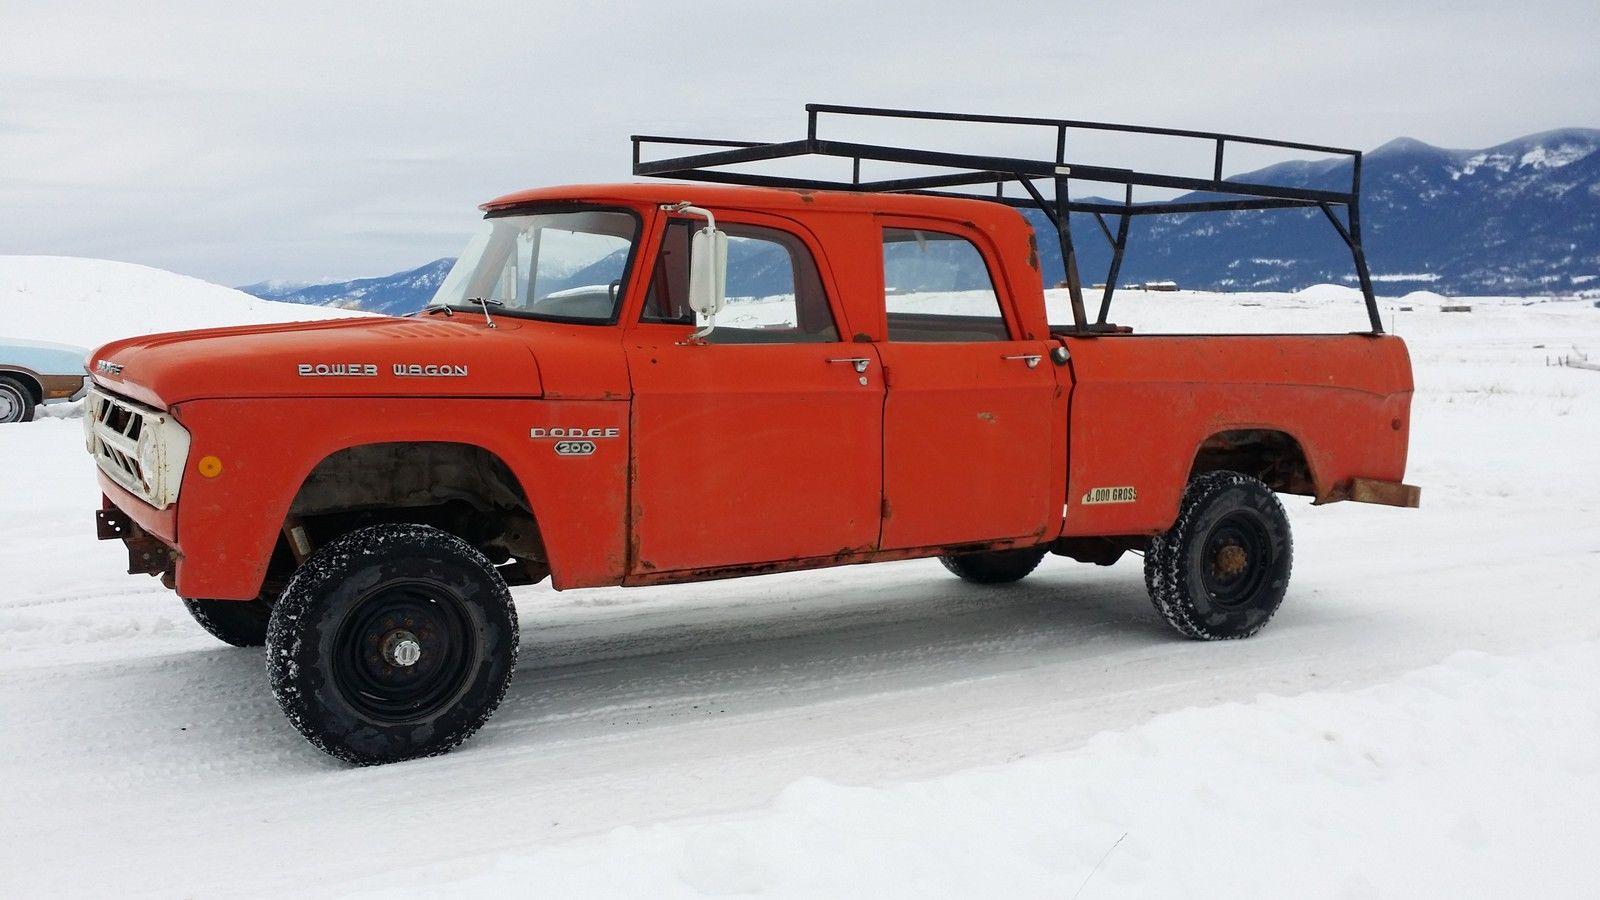 Crew Cab International For Sale >> 1968 W200 Dodge Power Wagon Crew Cab | Autos Post